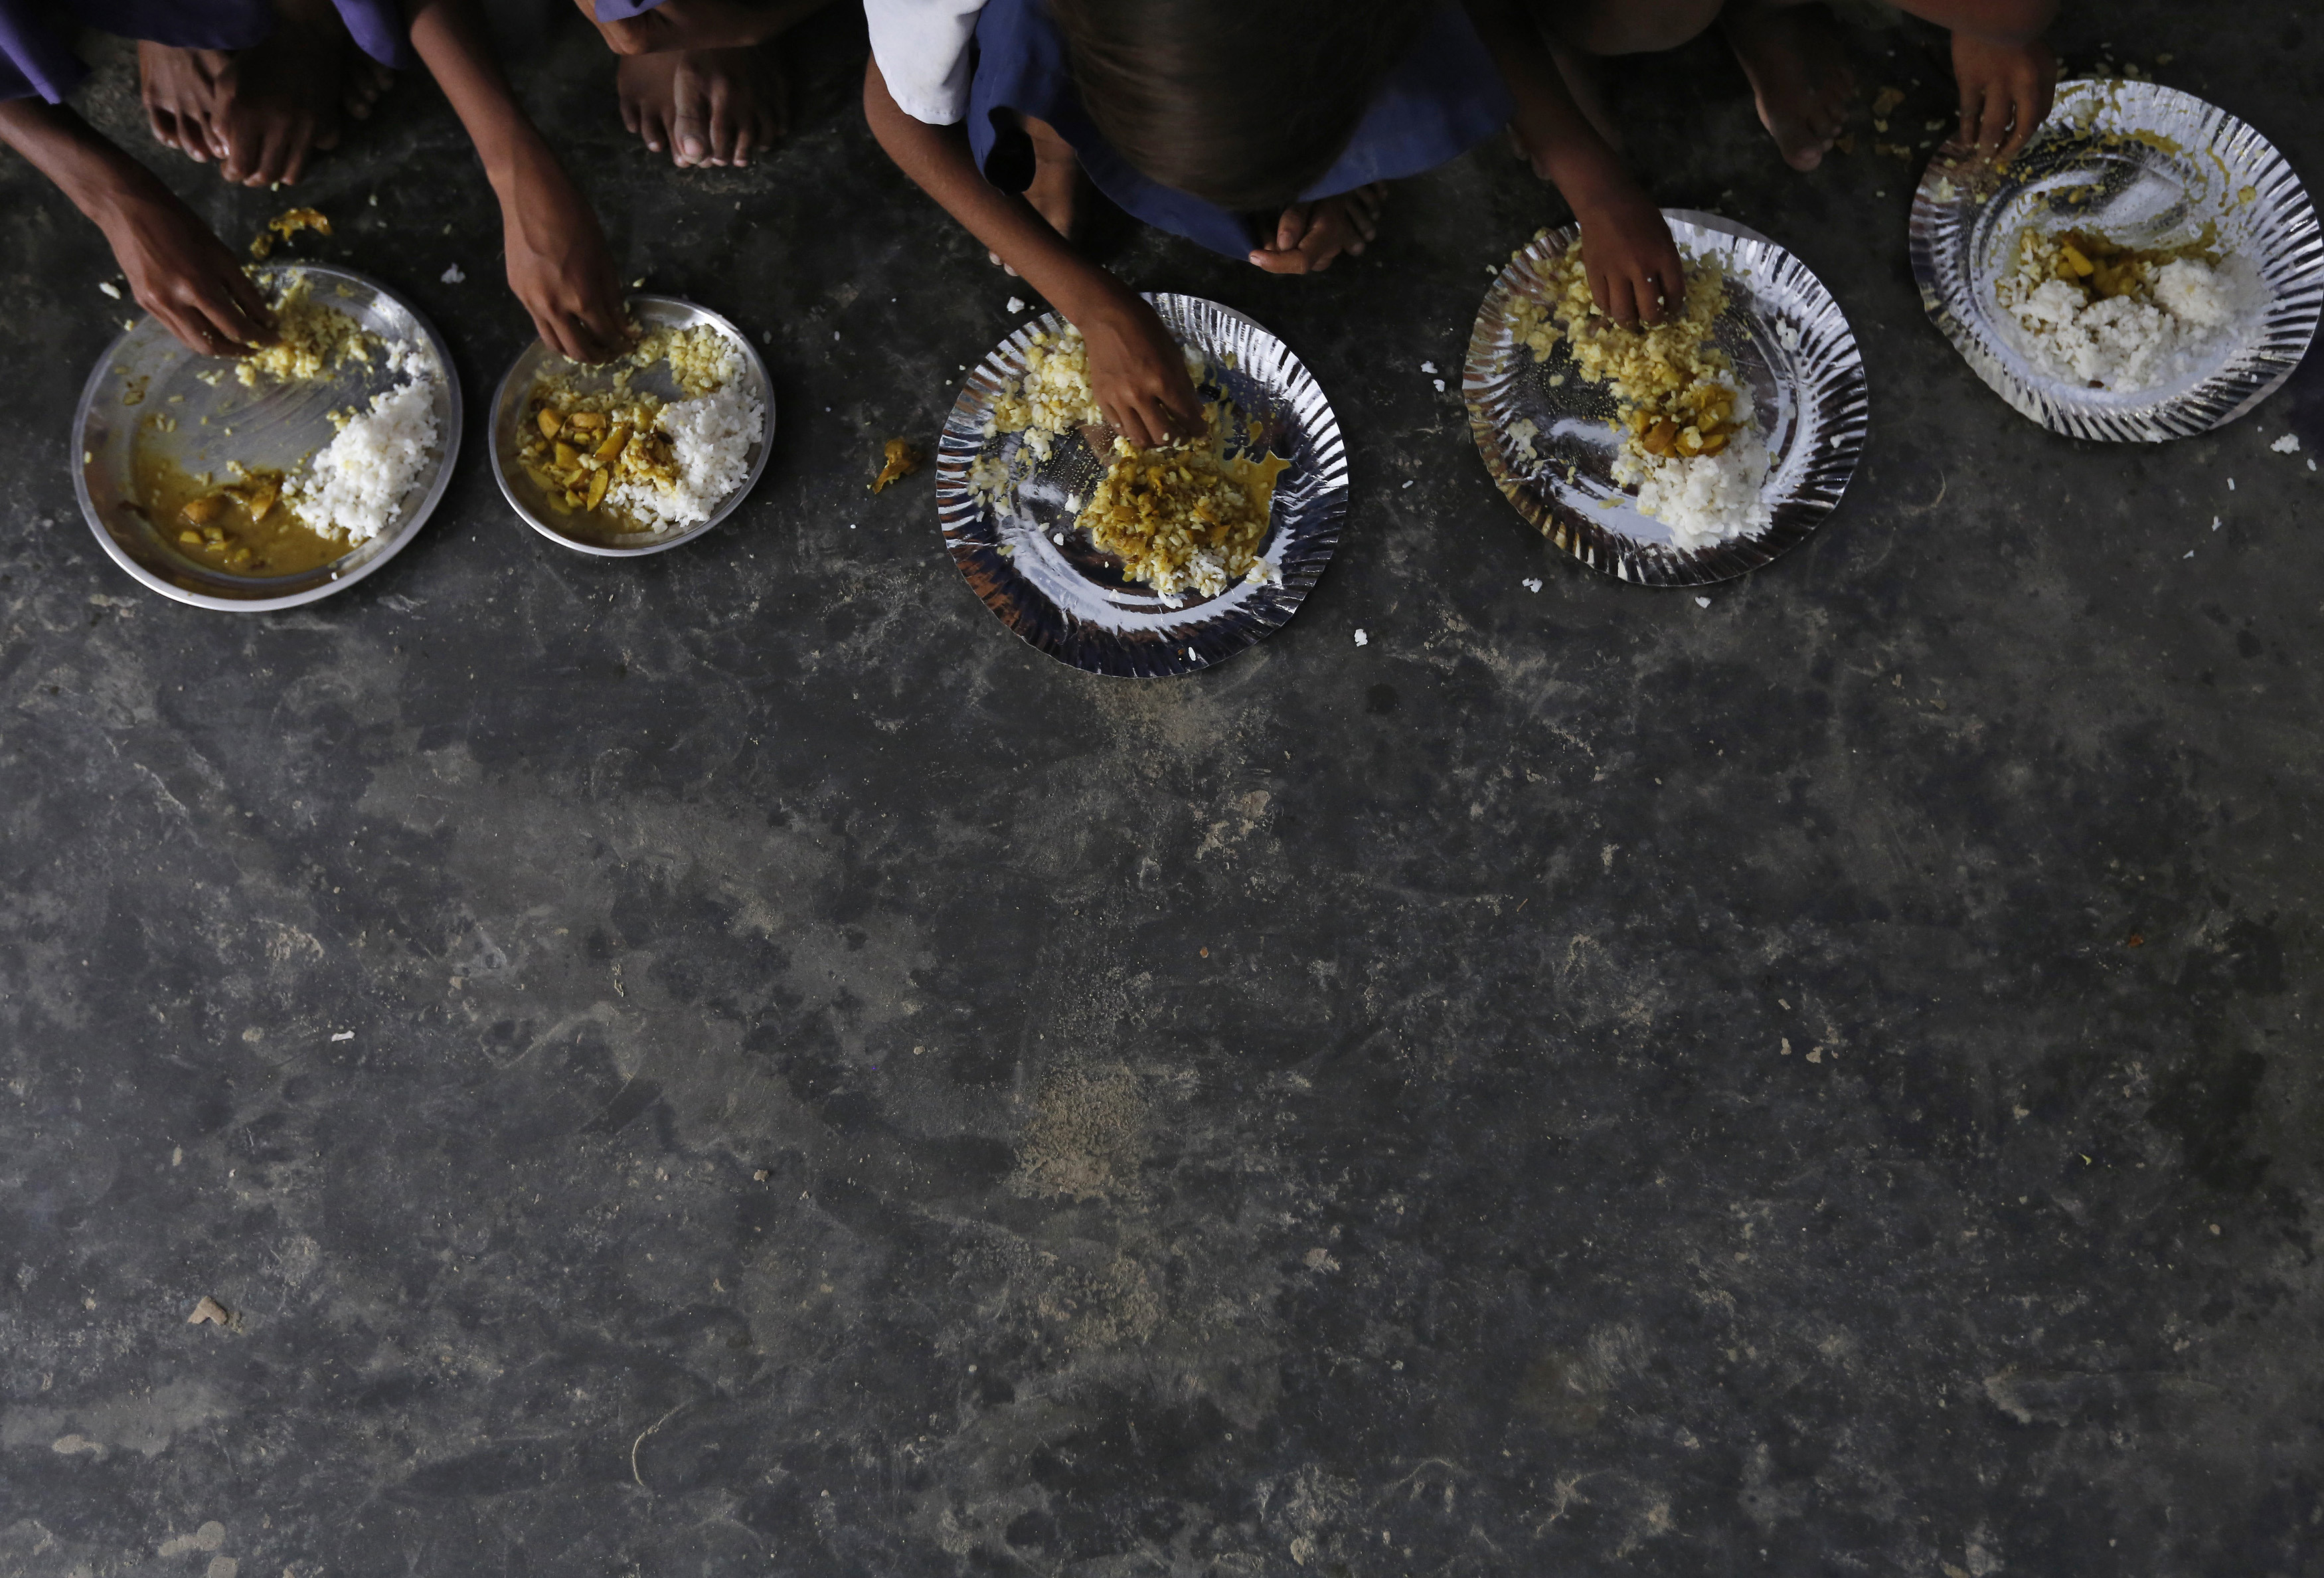 Schoolchildren eat their free mid-day meal